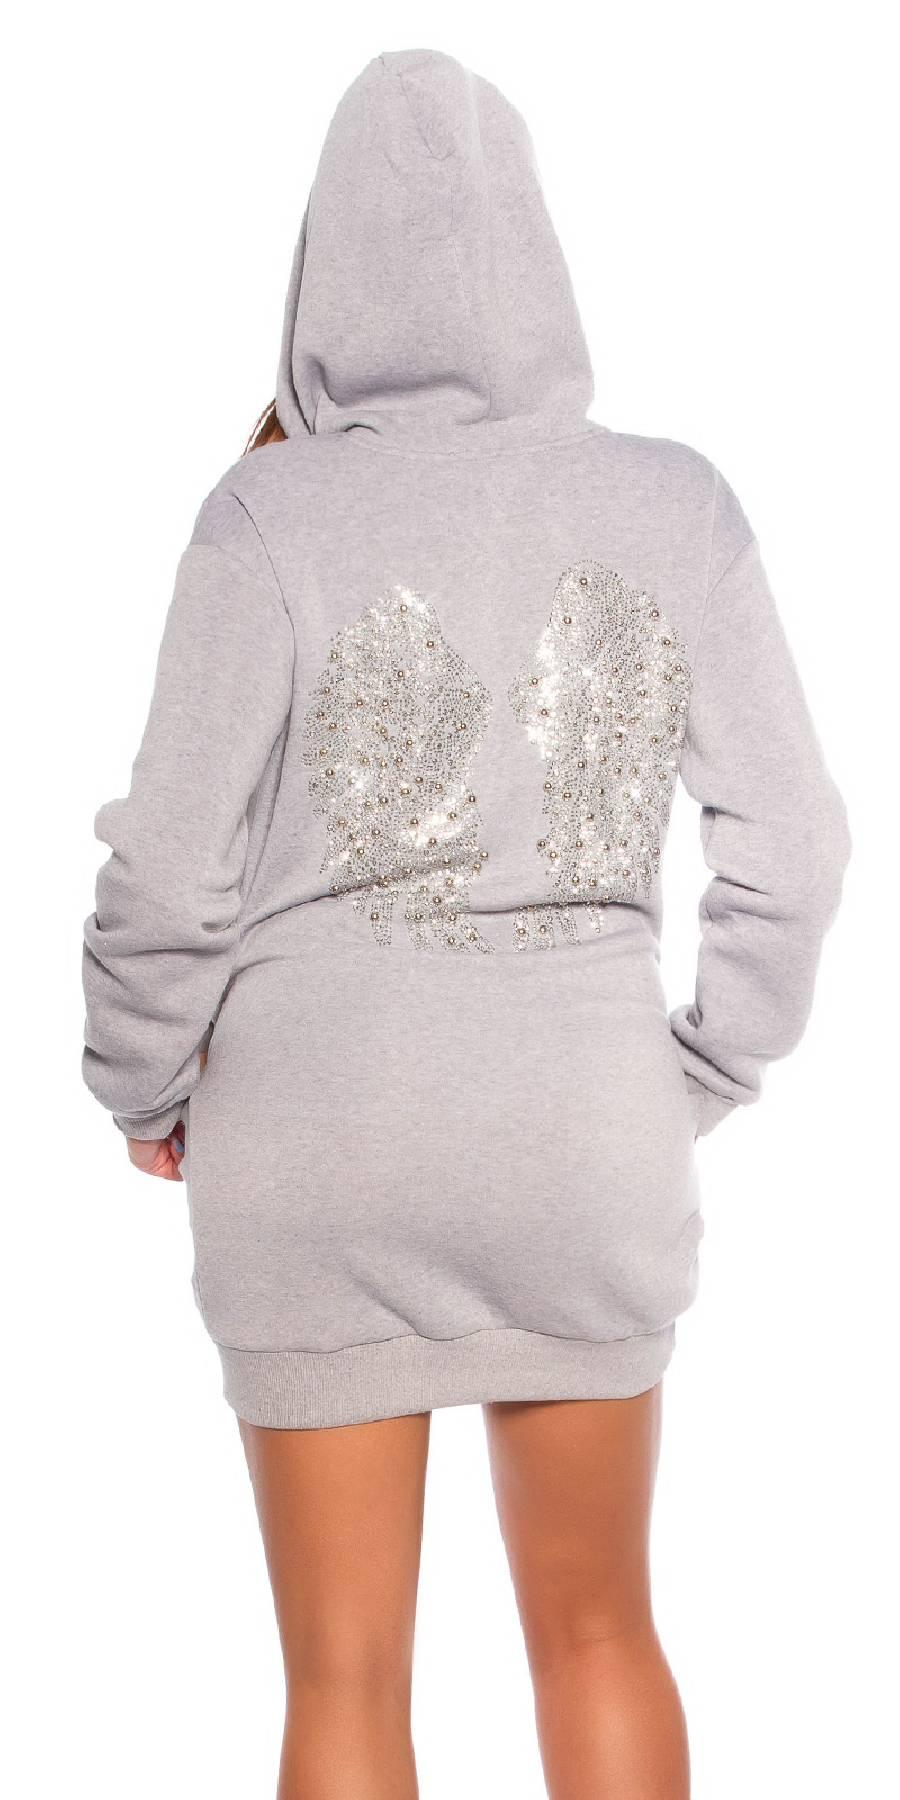 Veste sexy sportswear ANTONIA couleur gris